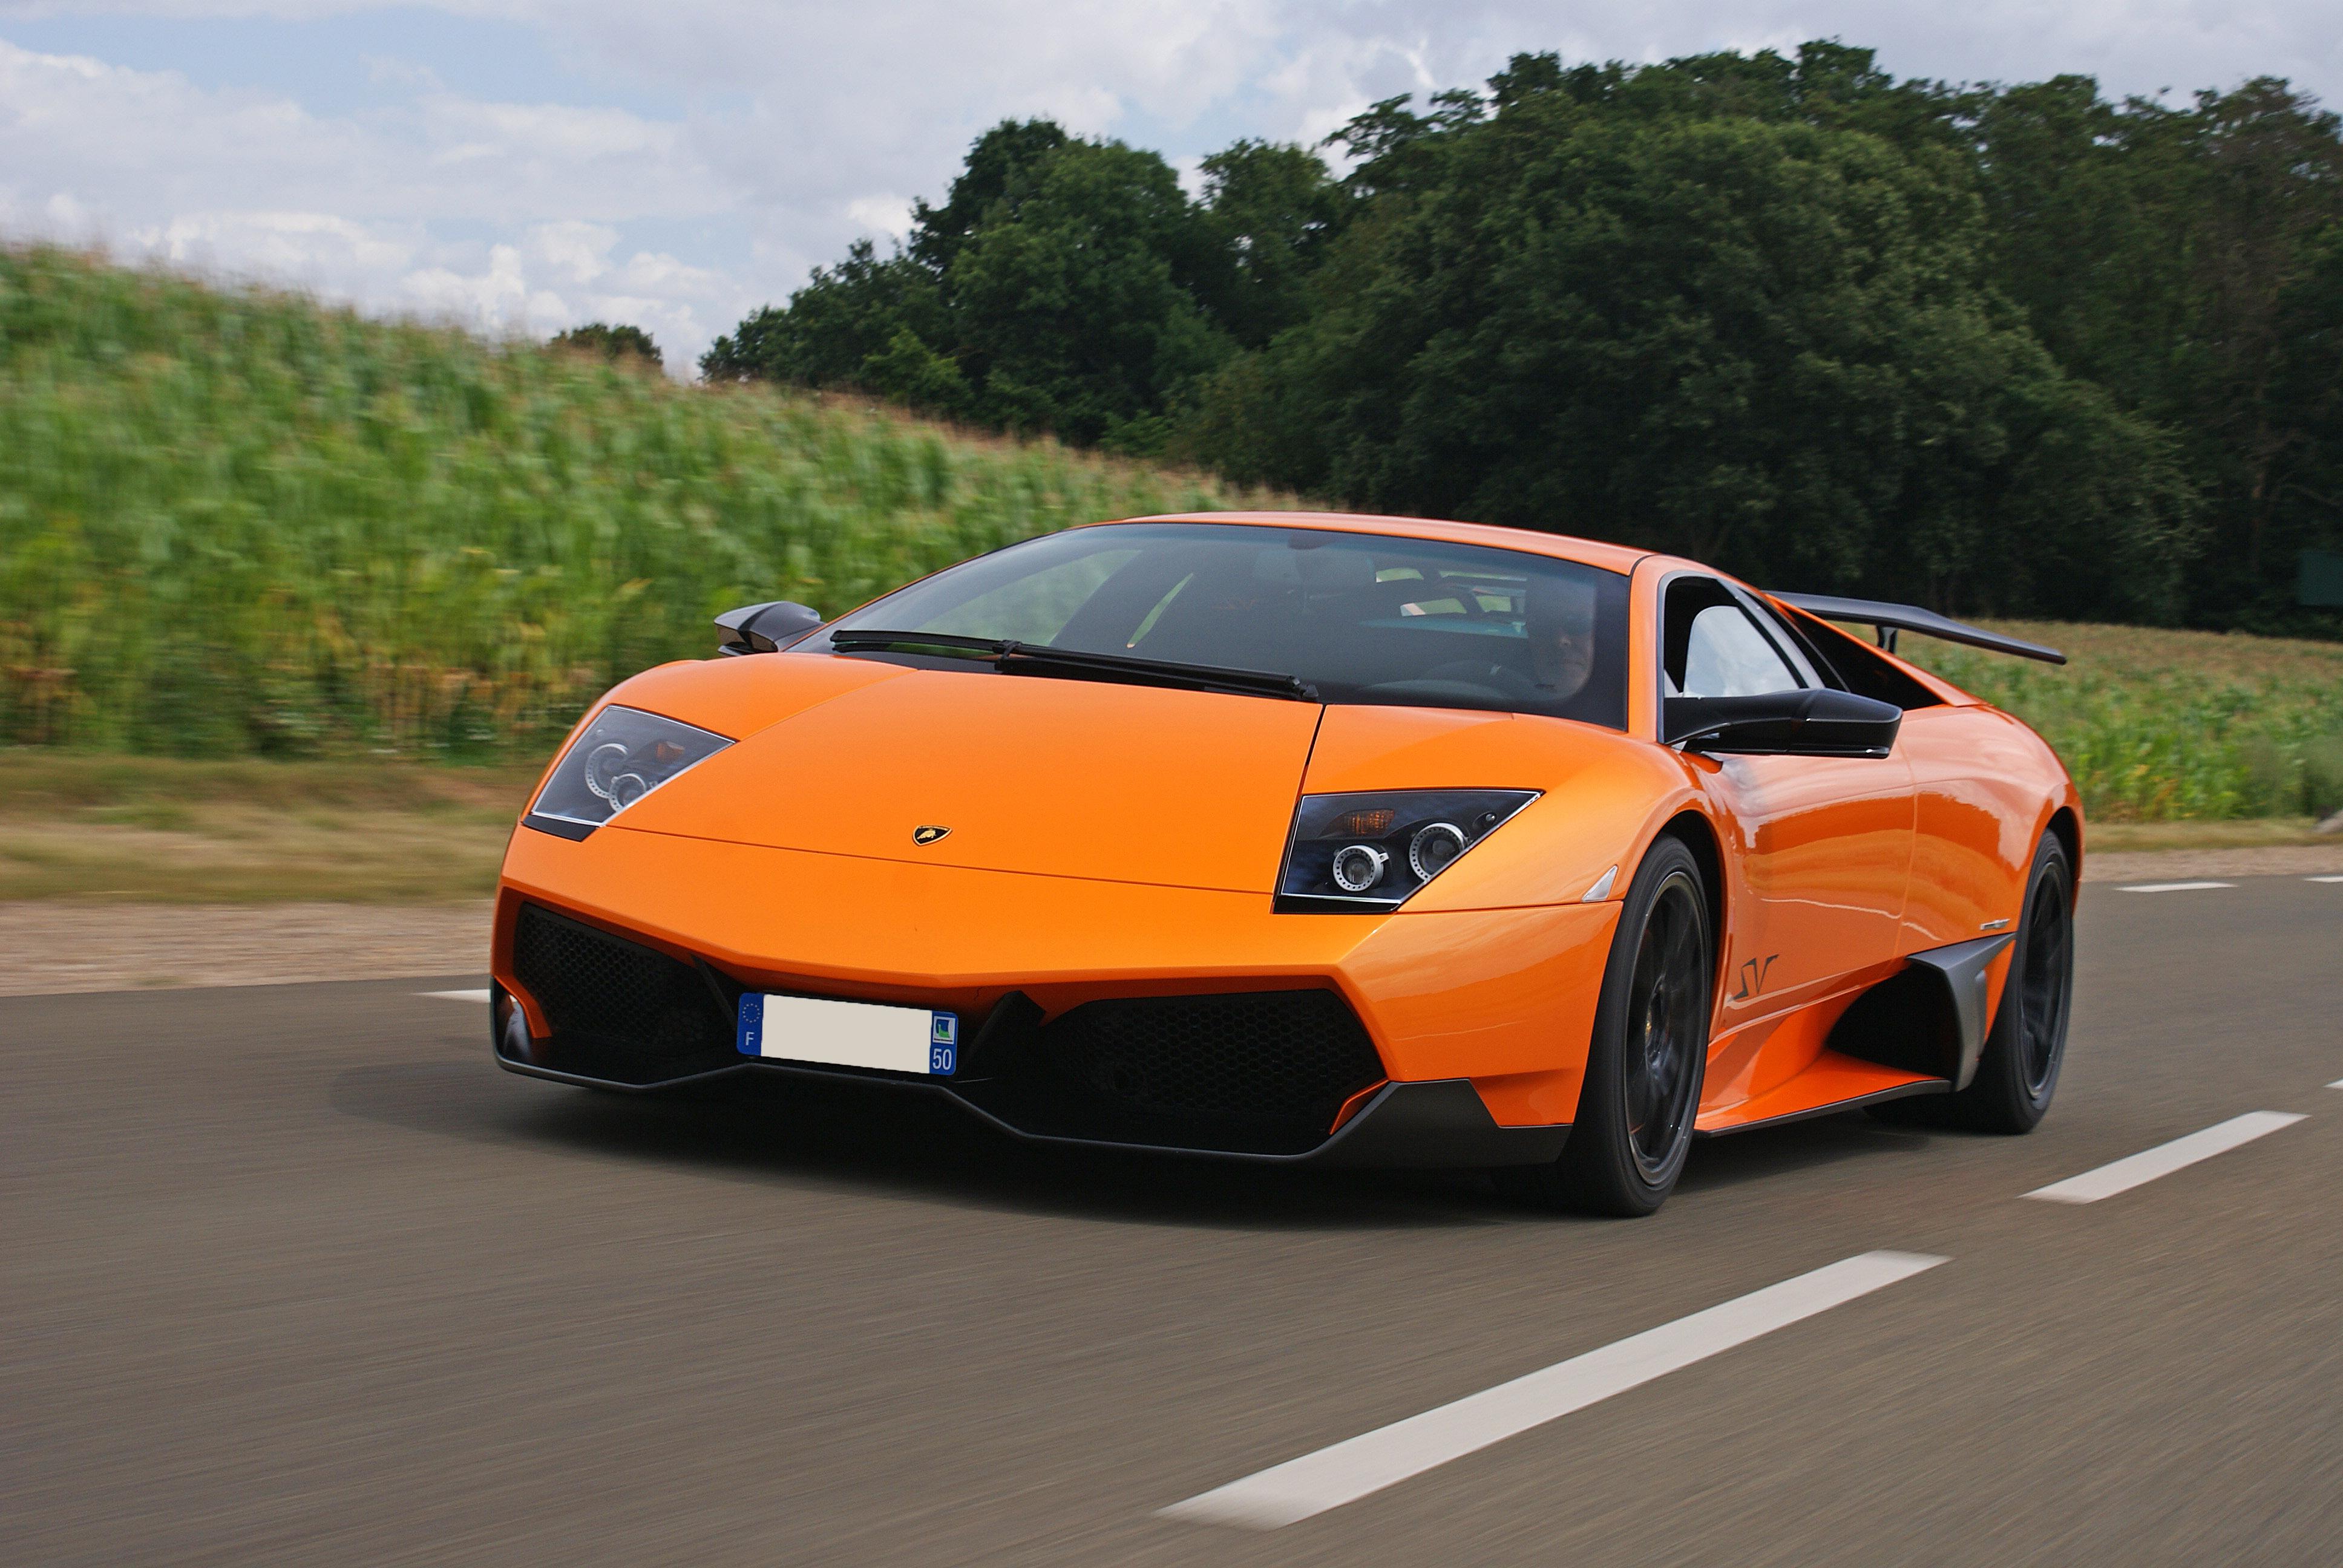 Lamborghini Murcielago Download Free Backgrounds Hd